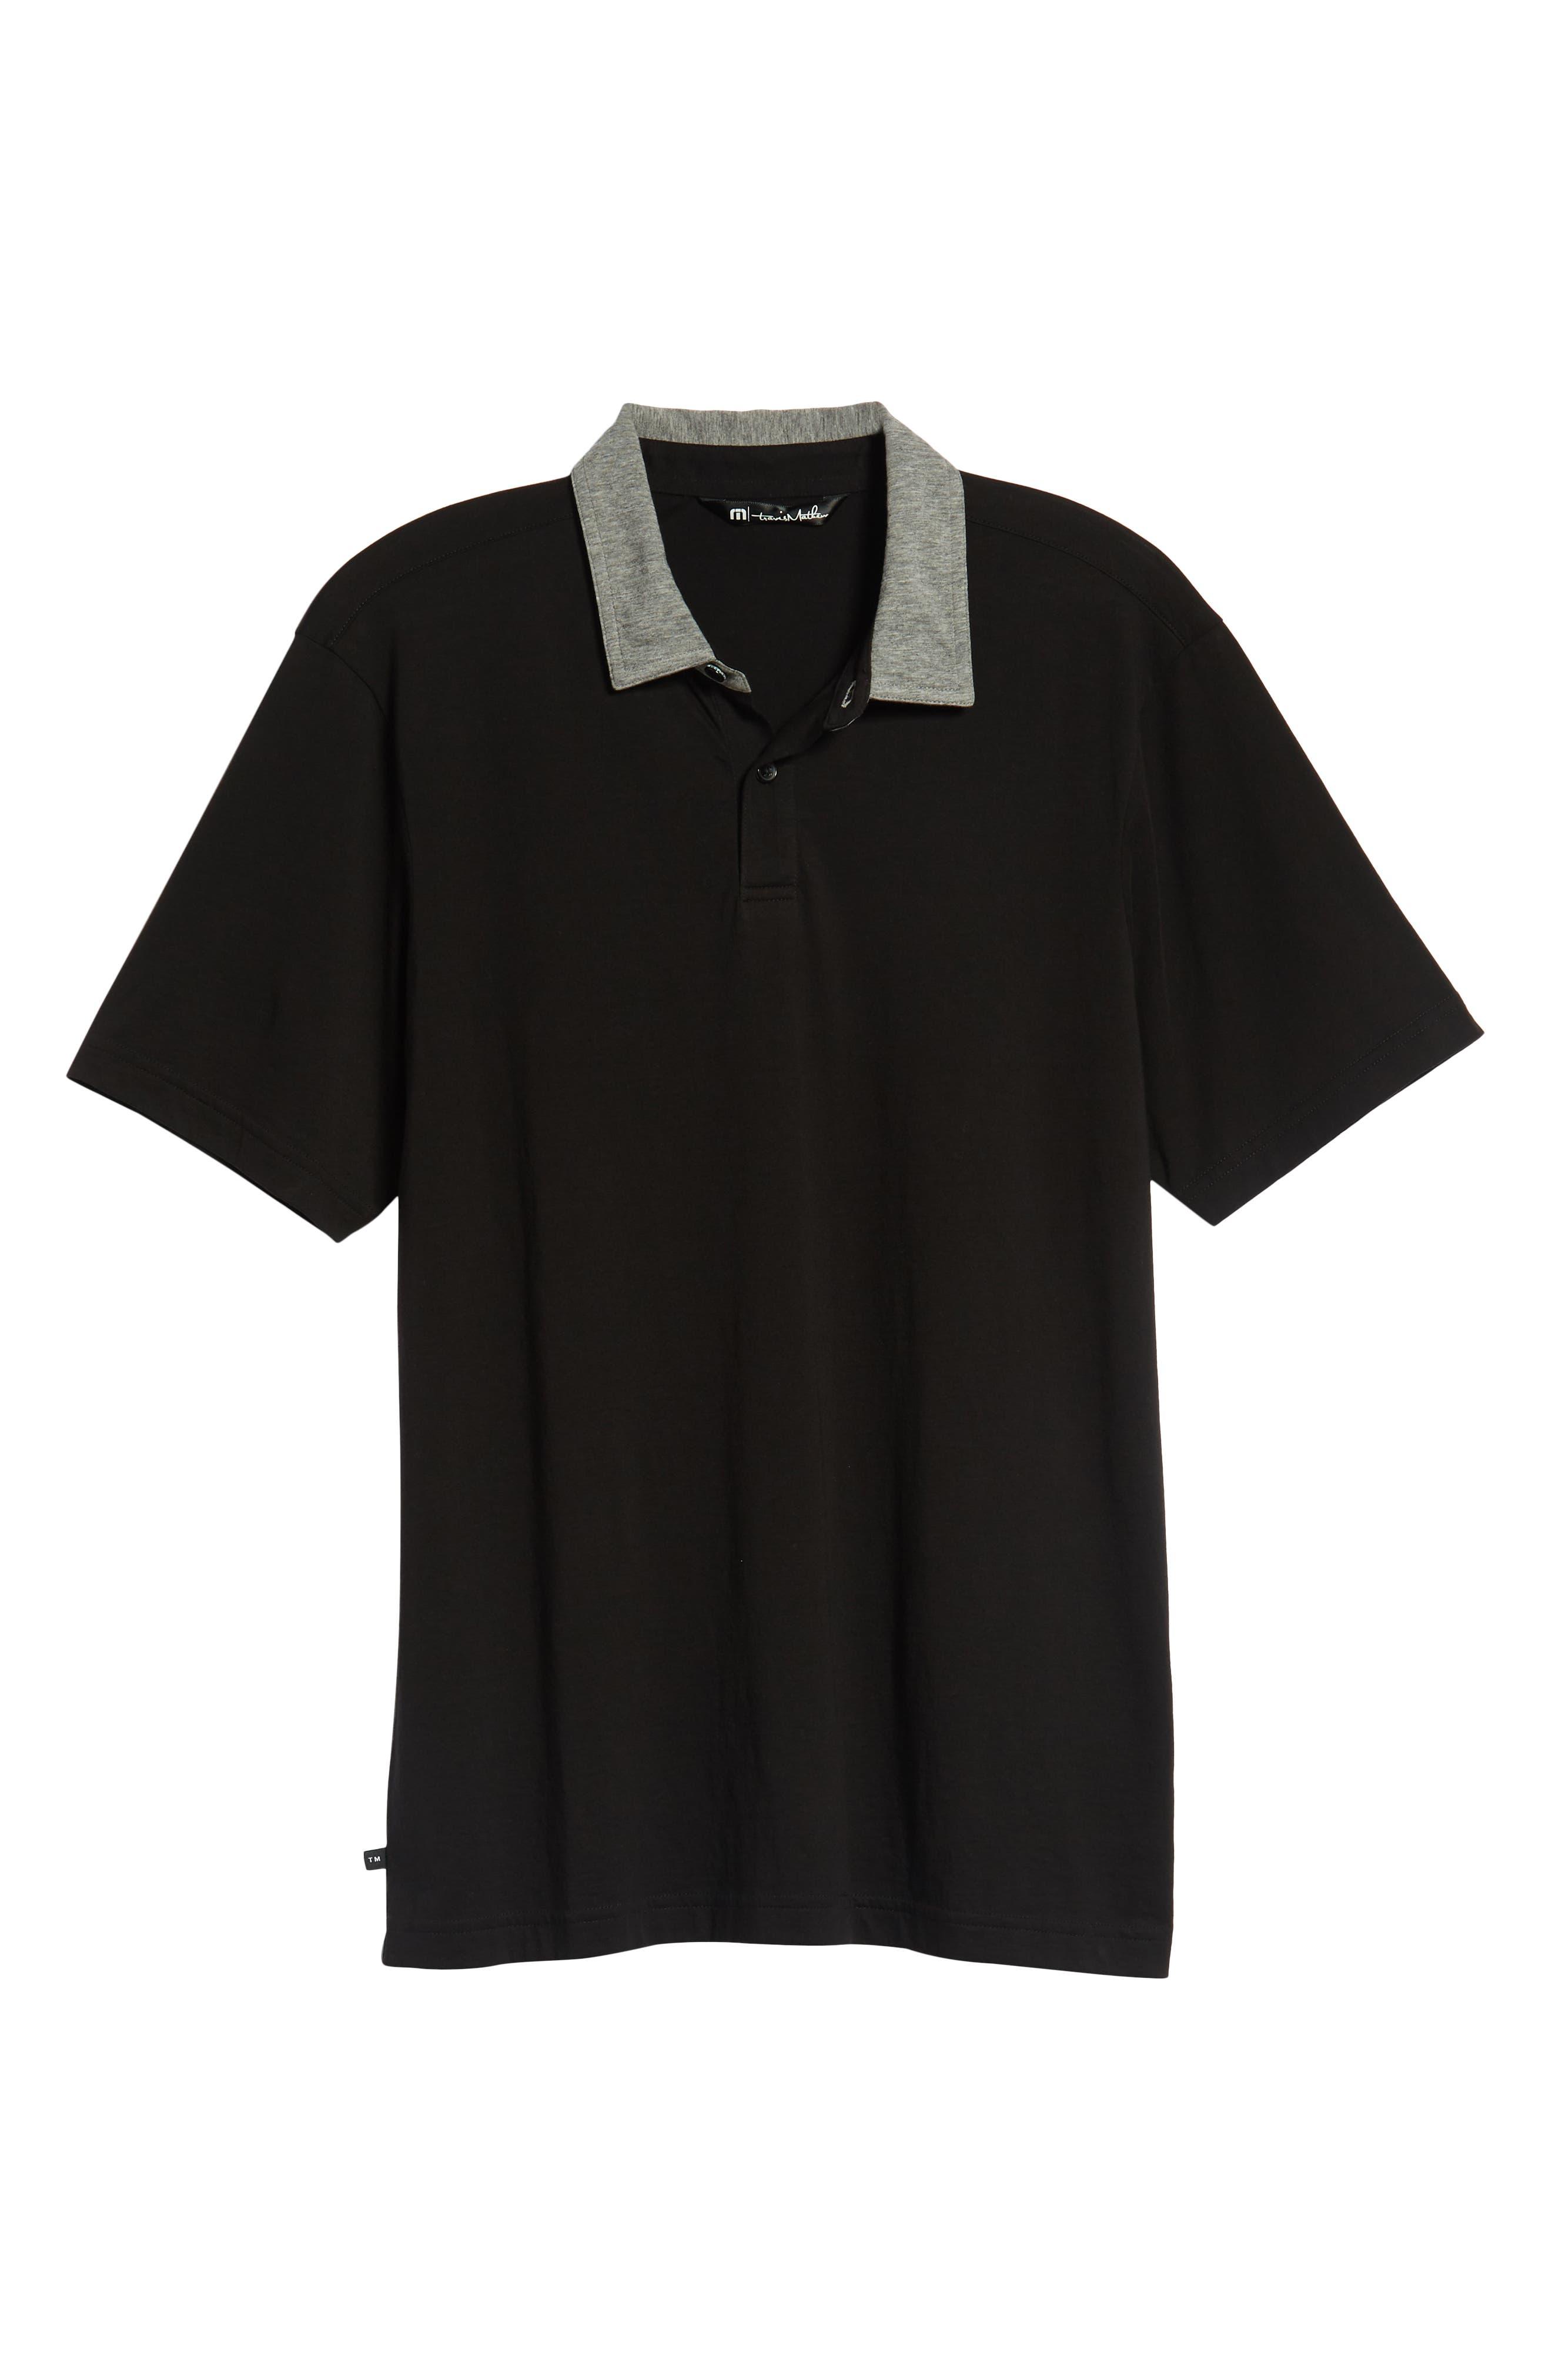 Rupert Short Sleeve Regular Fit Polo Shirt,                             Alternate thumbnail 6, color,                             BLACK